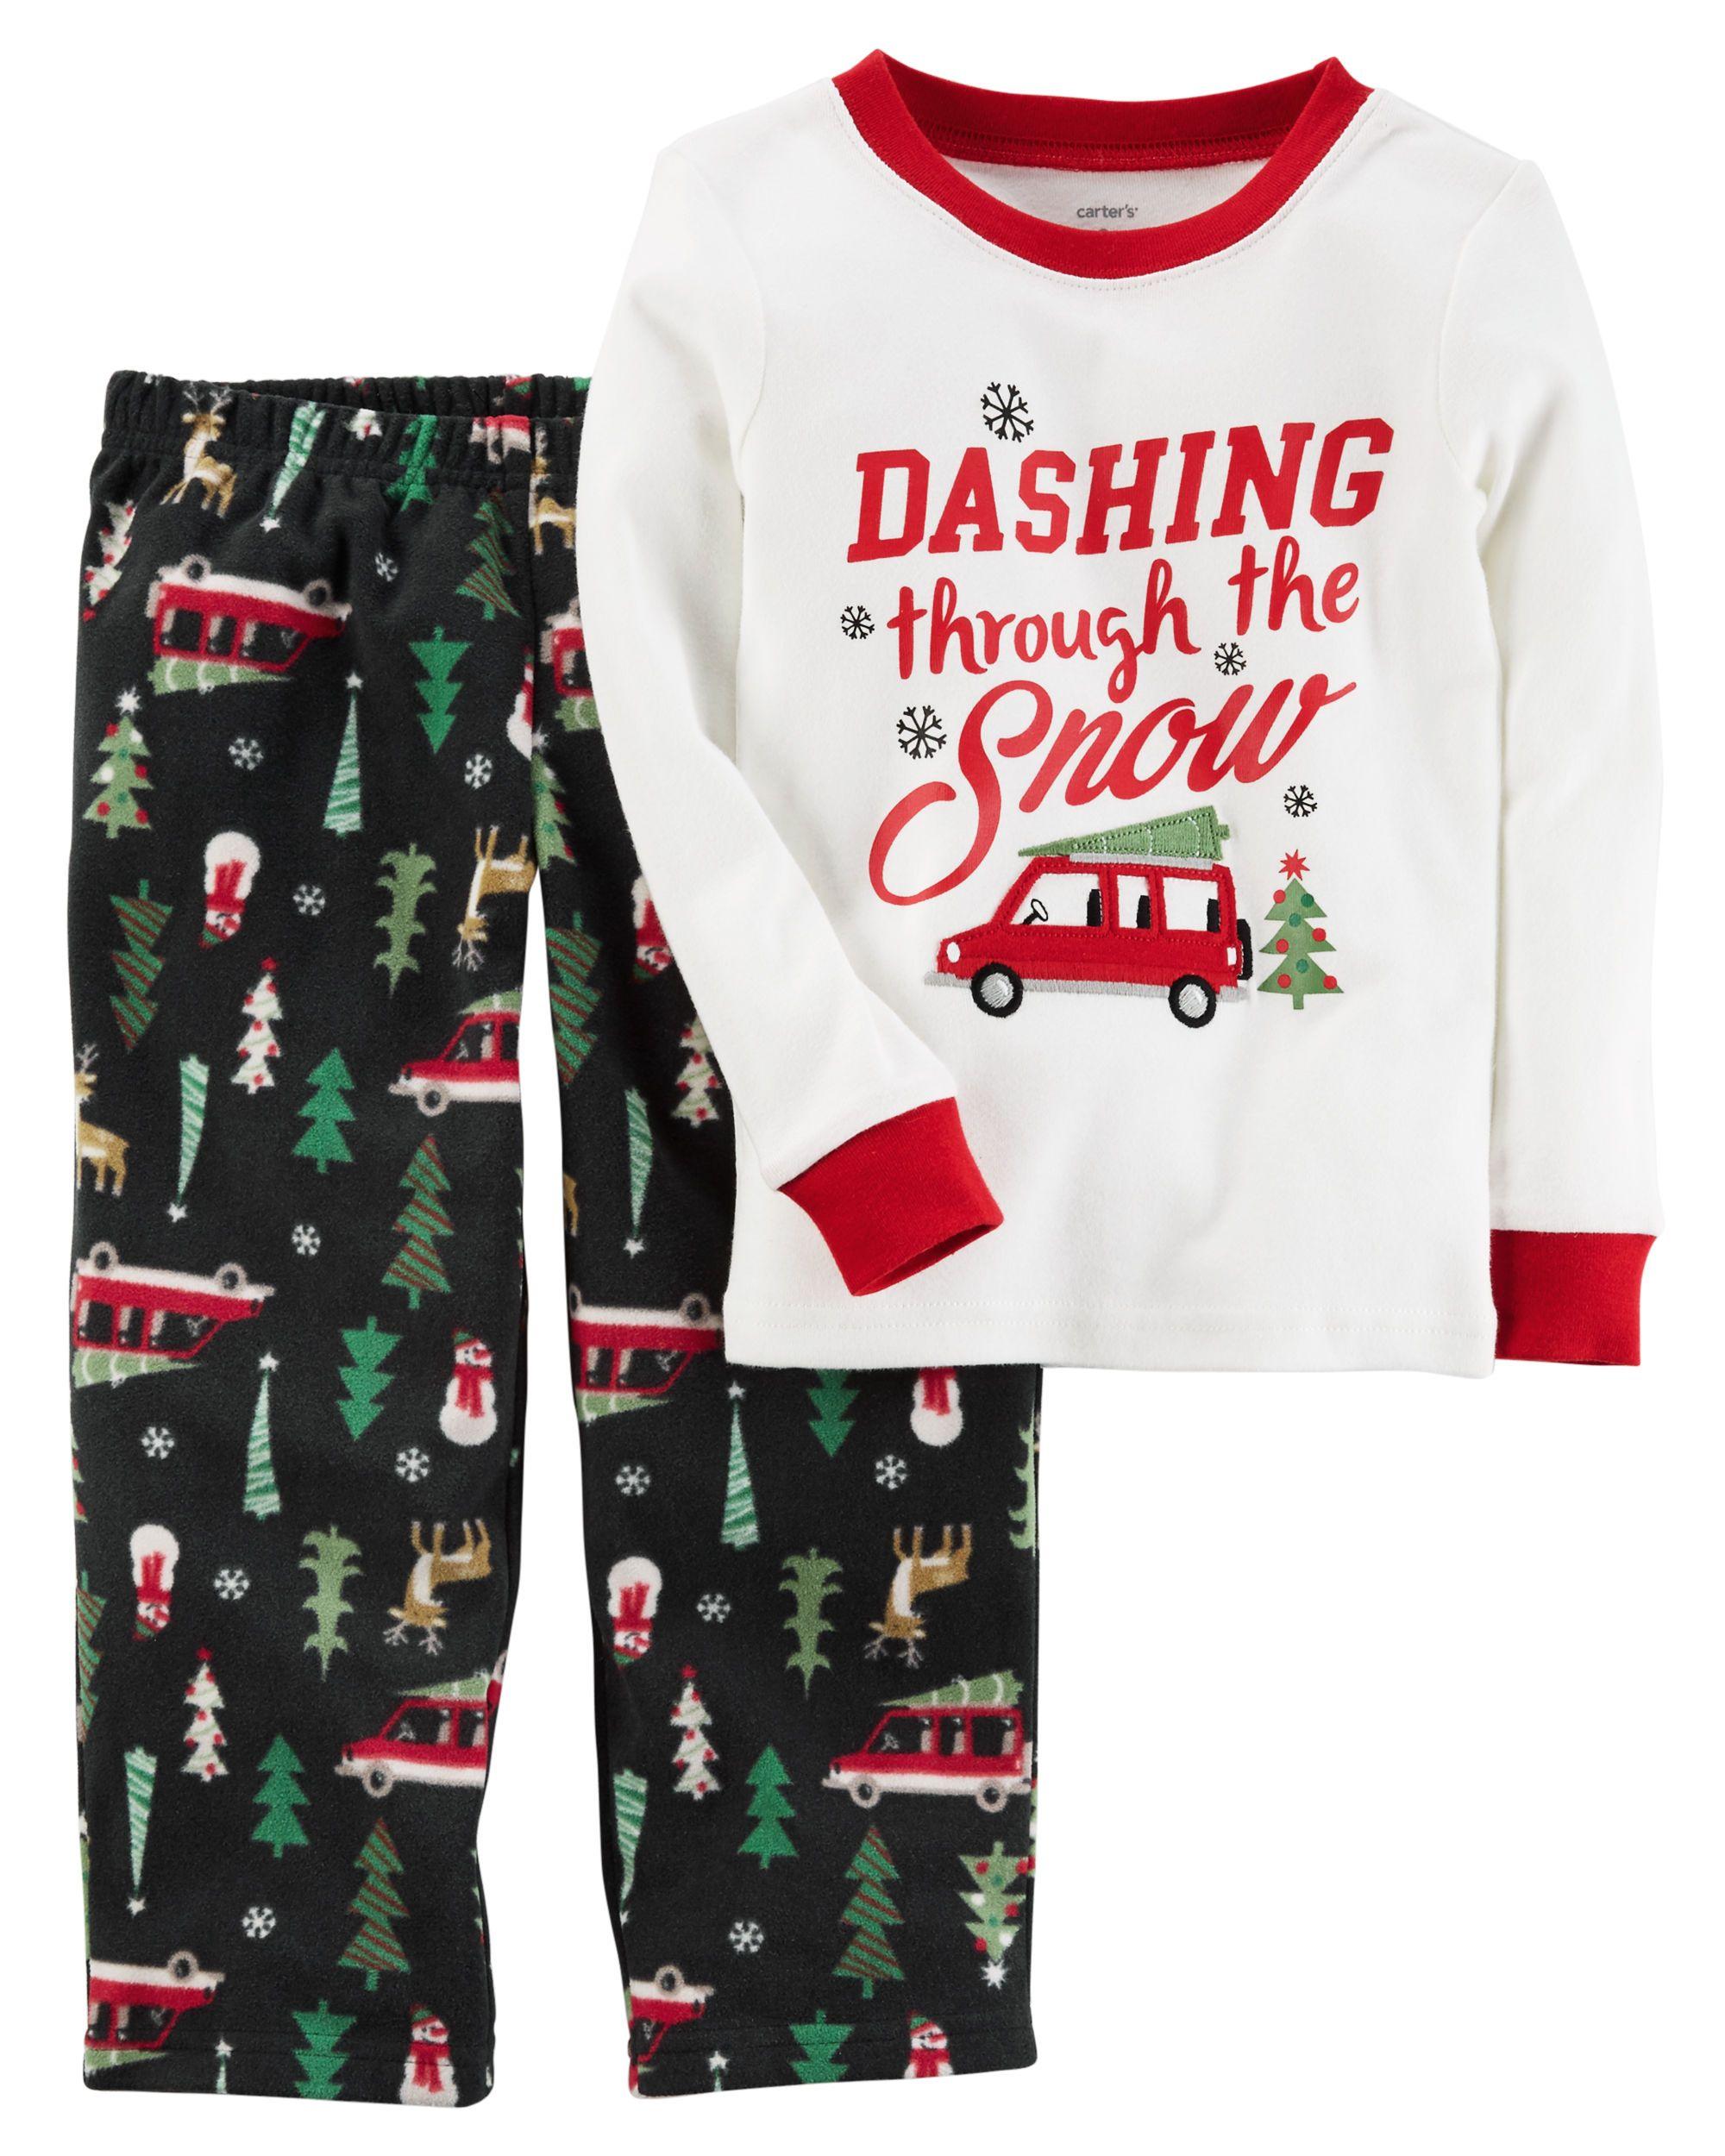 Toddler Boy Christmas Pajamas.2 Piece Christmas Cotton Fleece Pjs My Little Man Boys